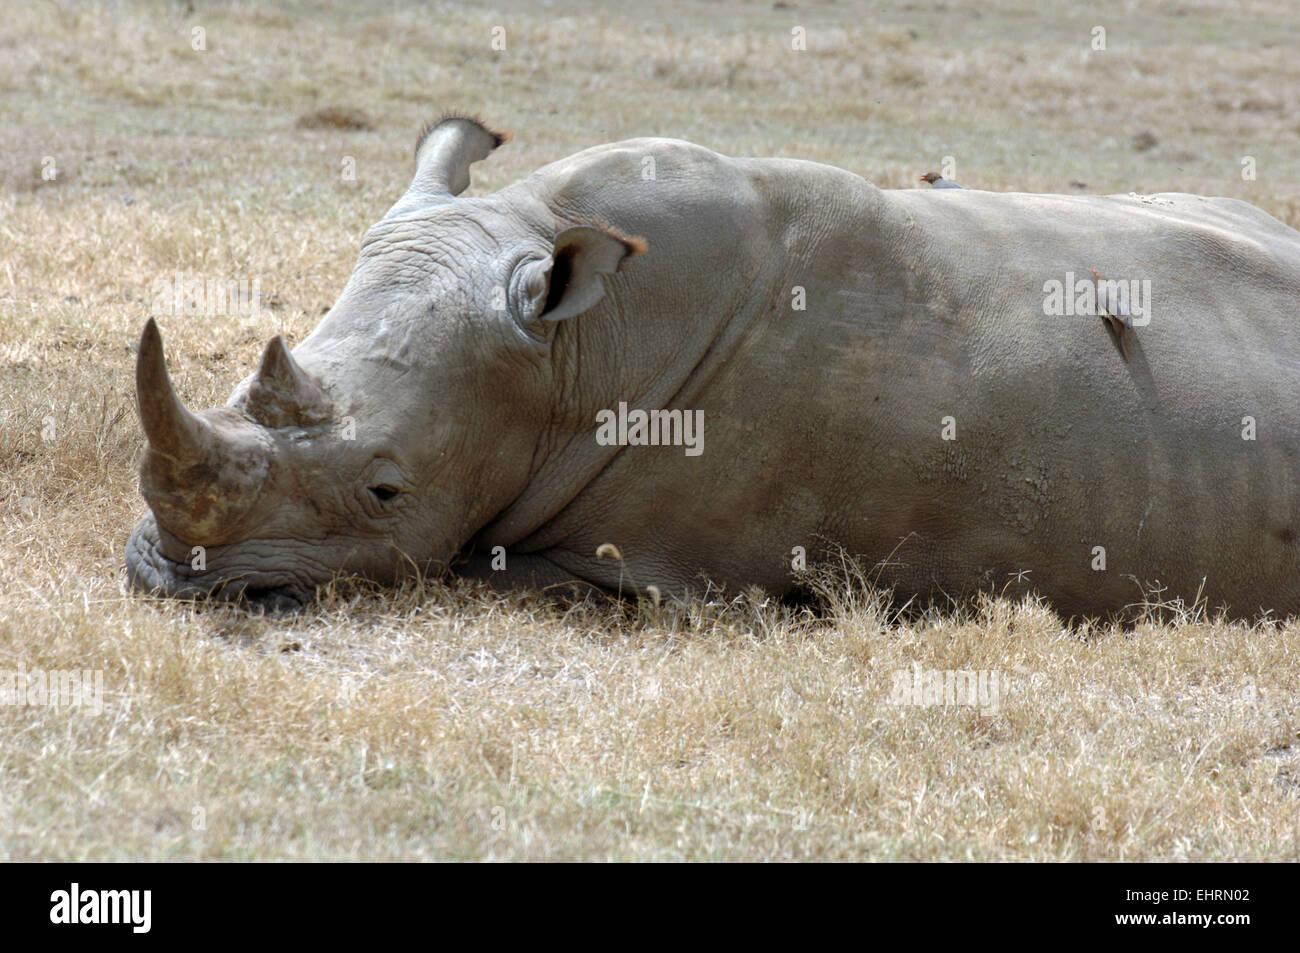 Rhino at Lake Nakuru National Park, Great Rift Valley, Kenya, Africa. Stock Photo